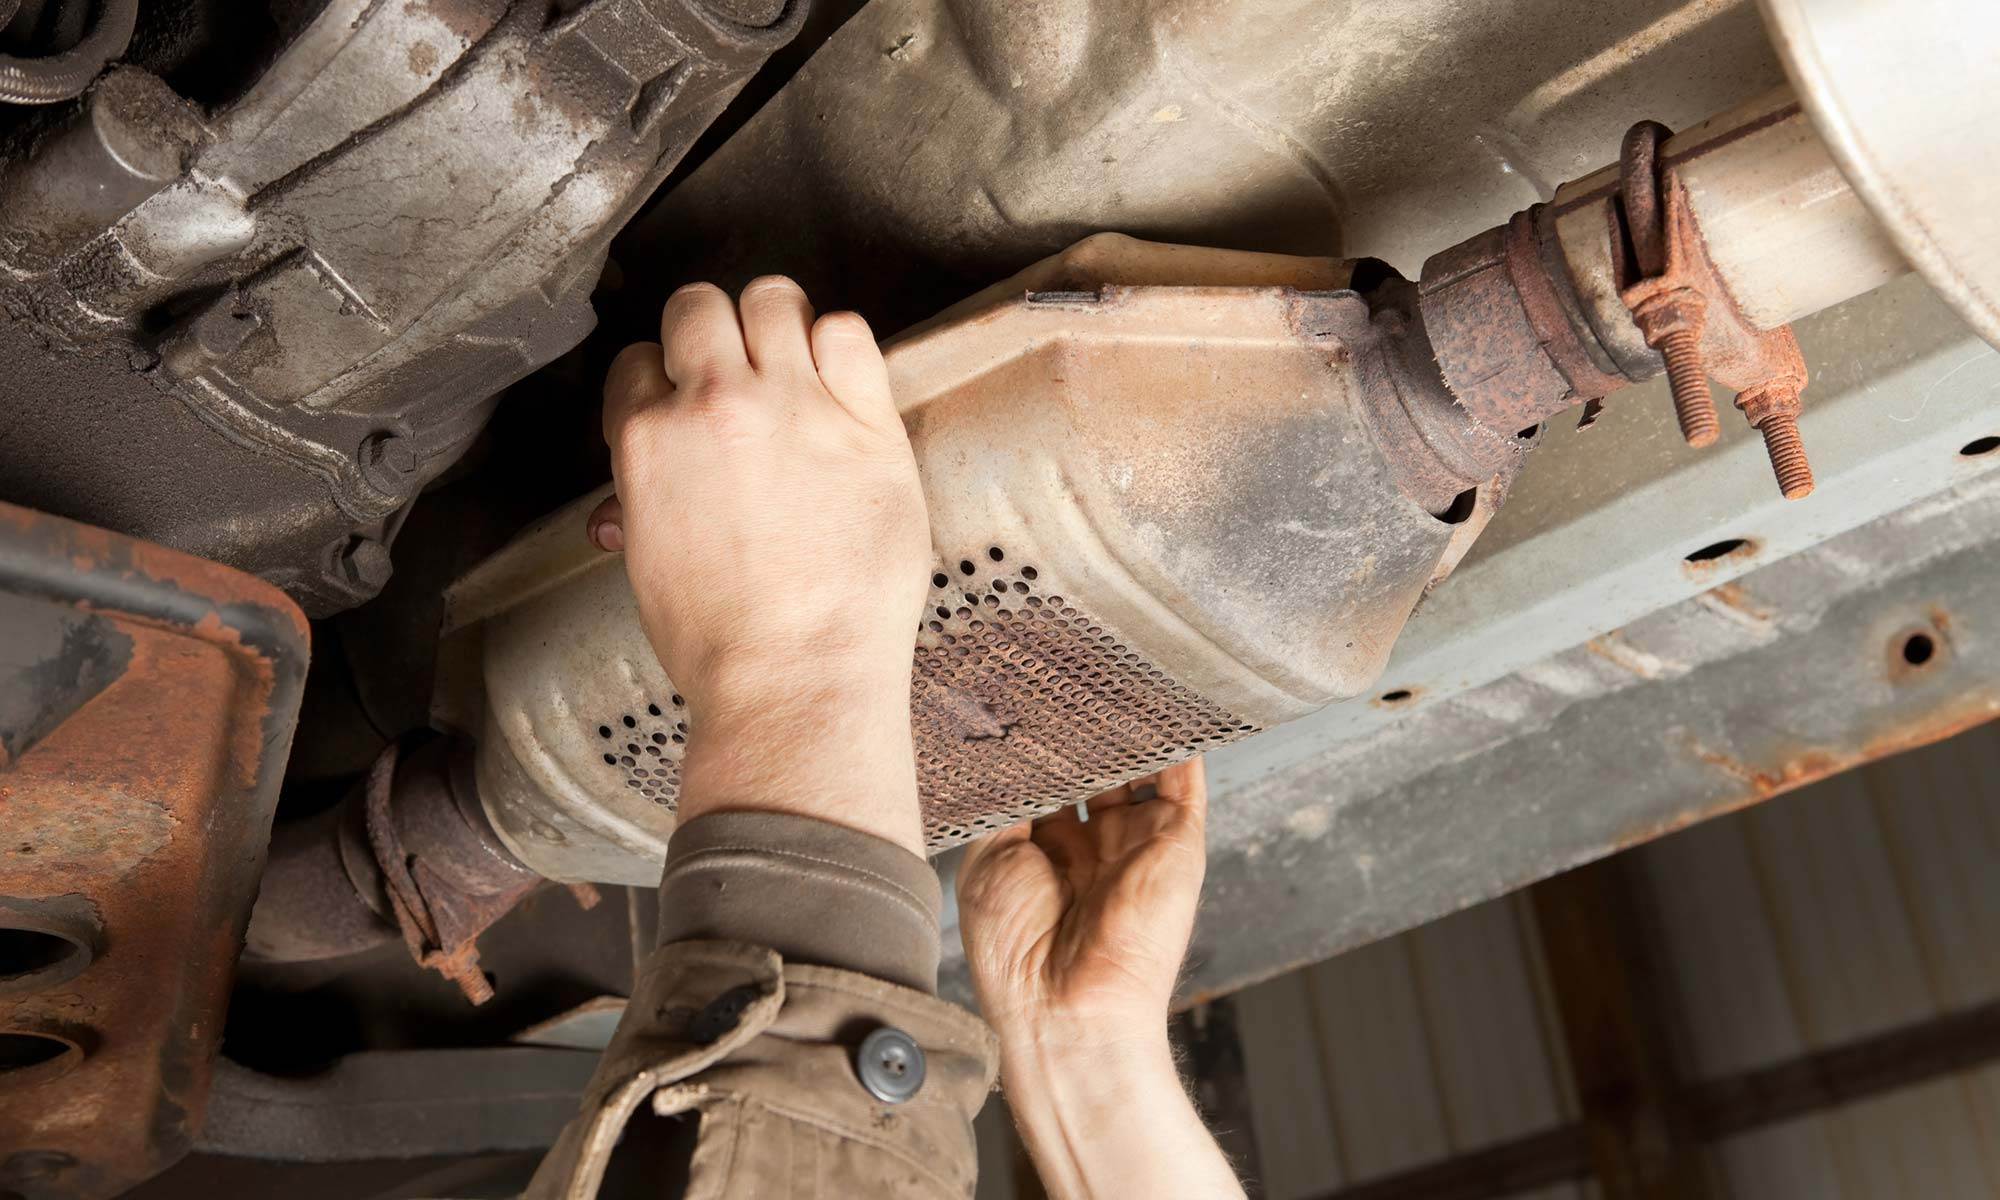 A mechanic fixing a catalytic converter.